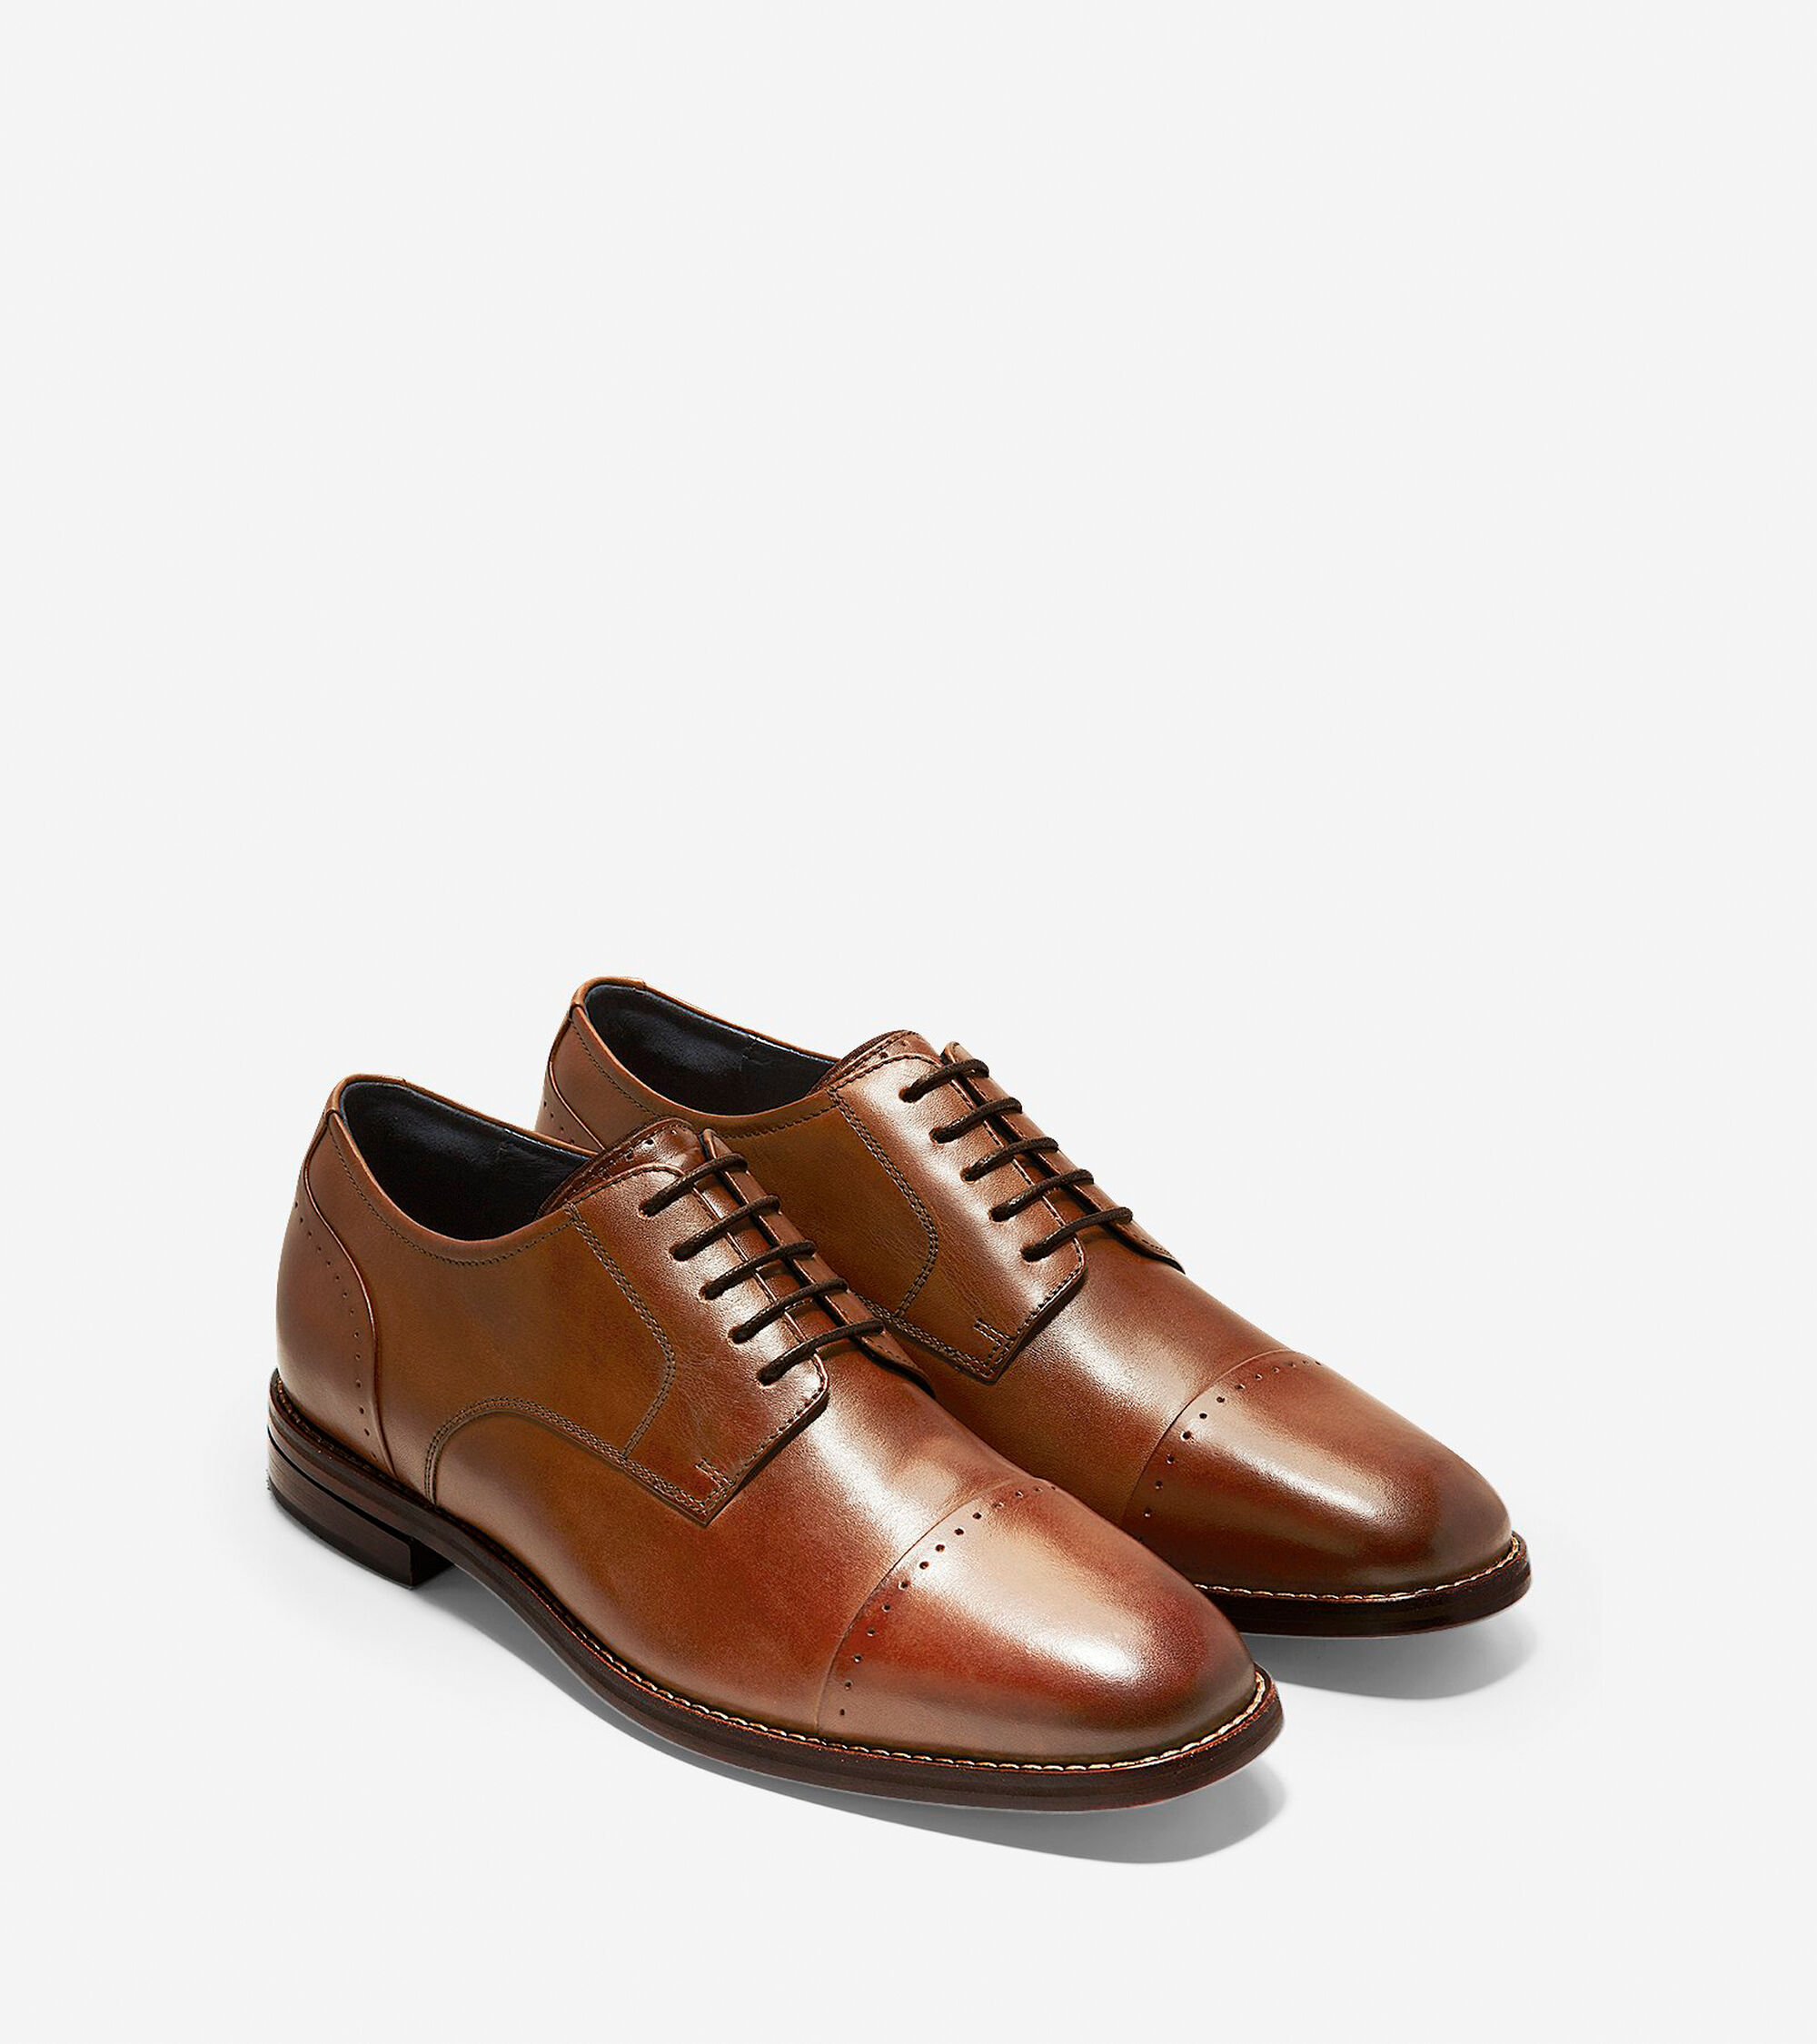 8d5f0ca47c8 Men s Giraldo Grand 2.0 Cap Toe Oxfords in British Tan